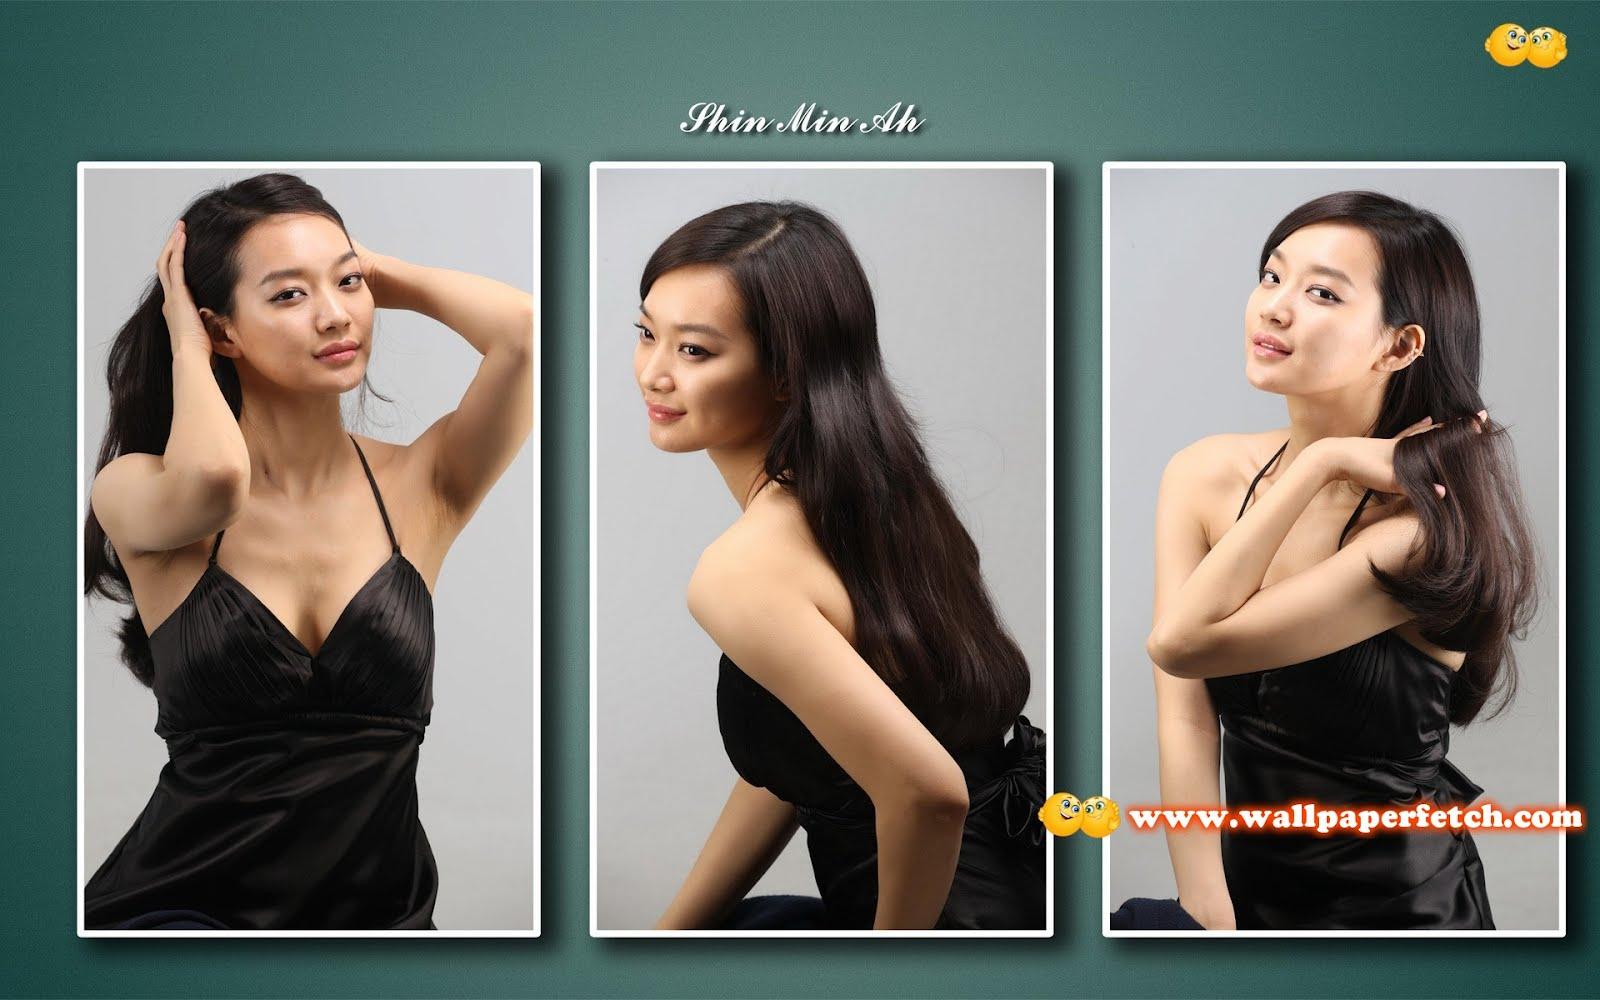 http://1.bp.blogspot.com/-HKal6Ab9yYM/T100KtIvibI/AAAAAAAABgc/Jexj2BeTBDA/s1600/shin-min-ah-9874-1920x1200.jpg